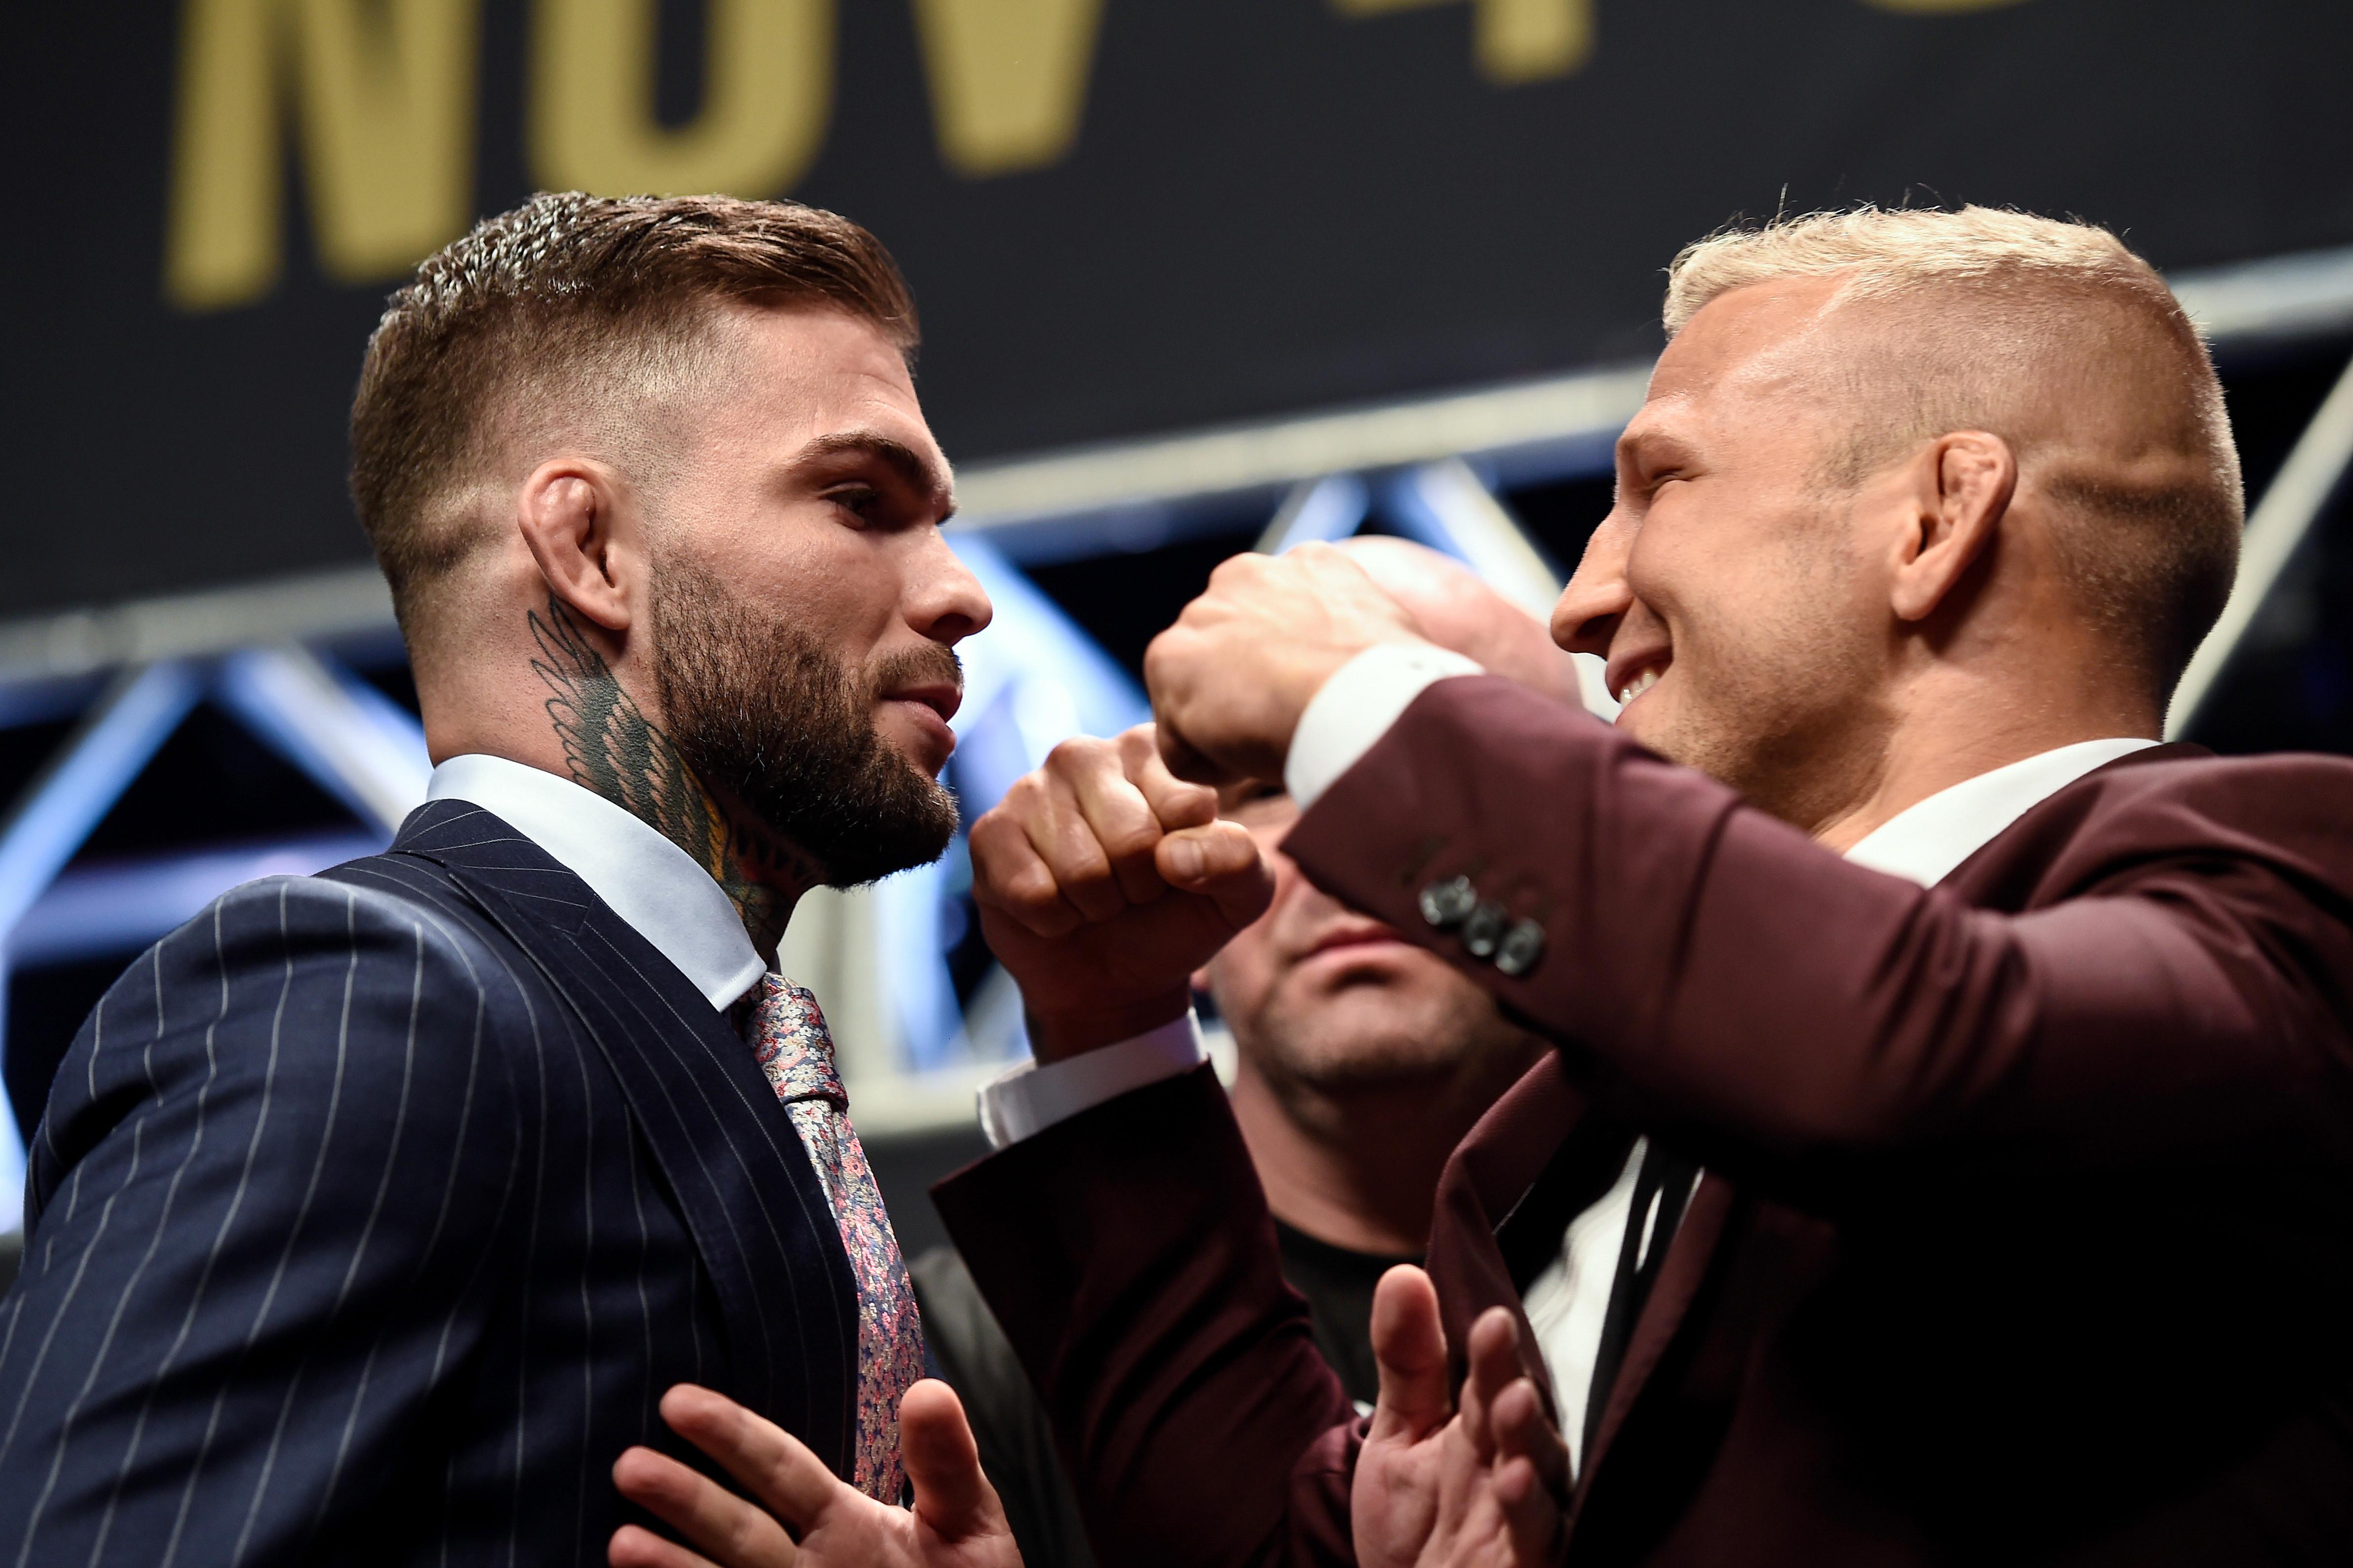 Cody Garbrandt TJ Dillashaw Settle Beef at UFC 217 Rolling Stone 4765x3175